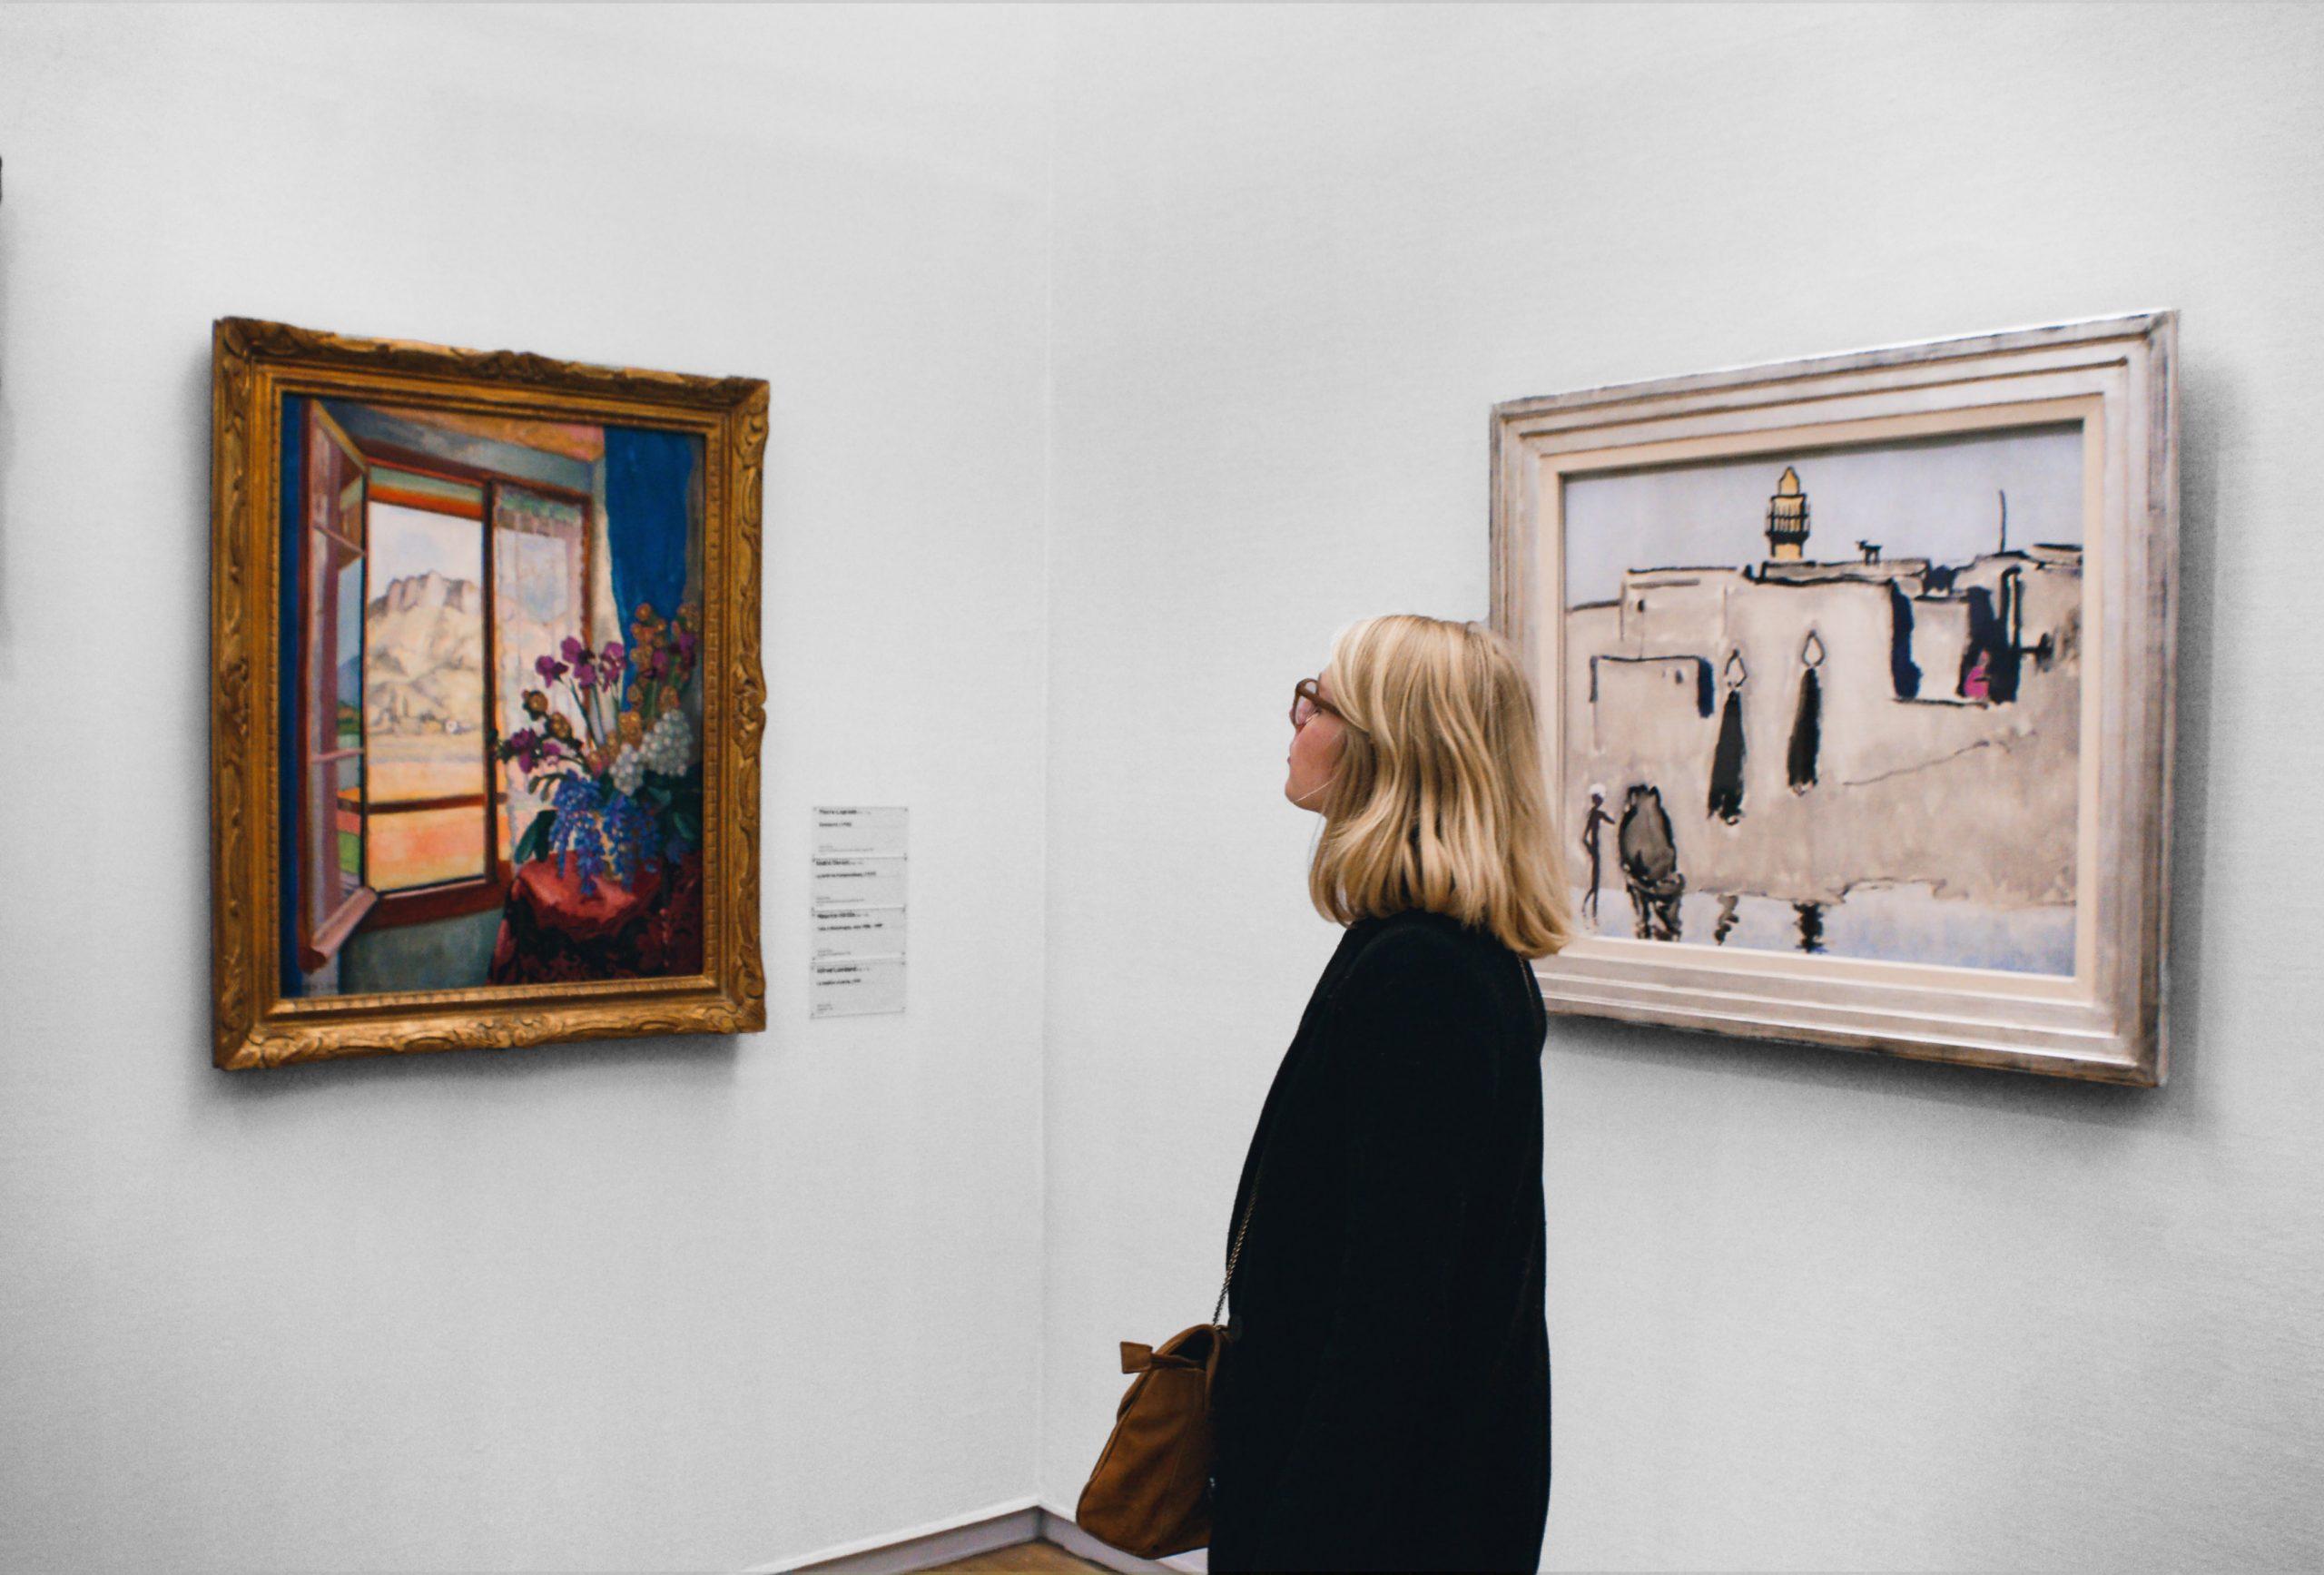 Best virtual art gallery visits in the UK